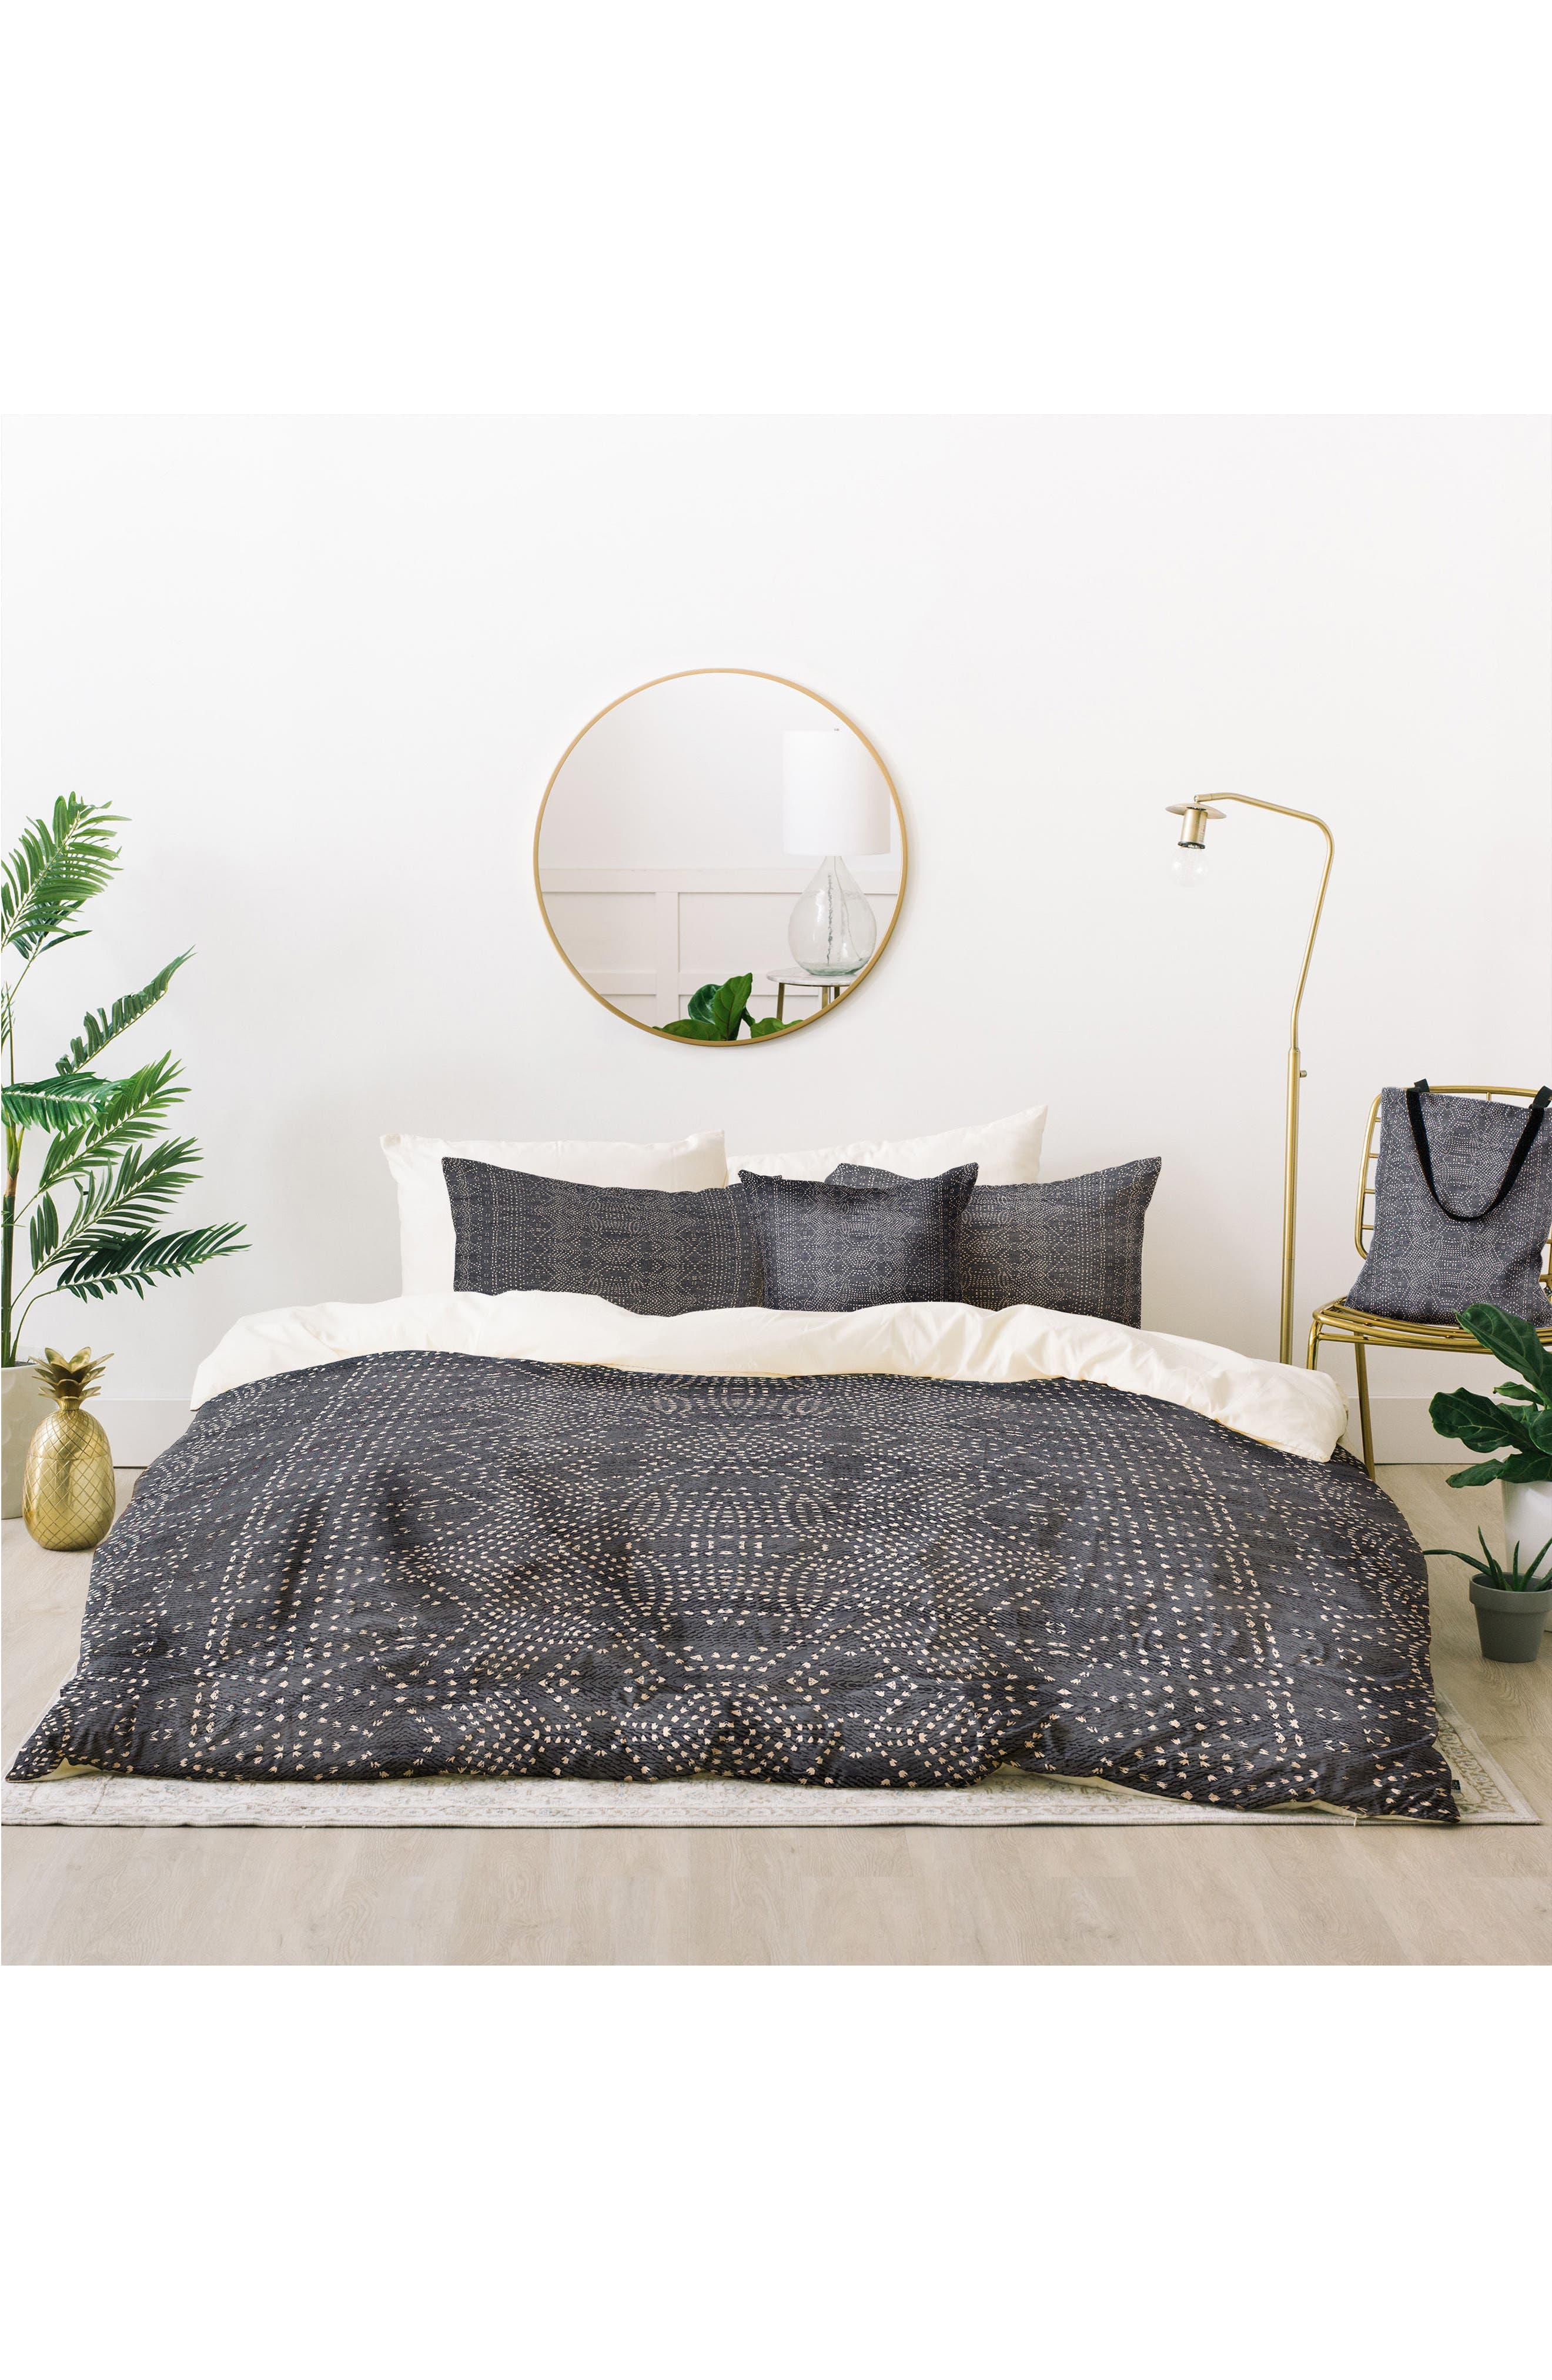 Holli Zollinger Marrakeshi Denim Bed in a Bag Duvet Cover, Sham & Accent Pillow Set,                             Main thumbnail 1, color,                             020